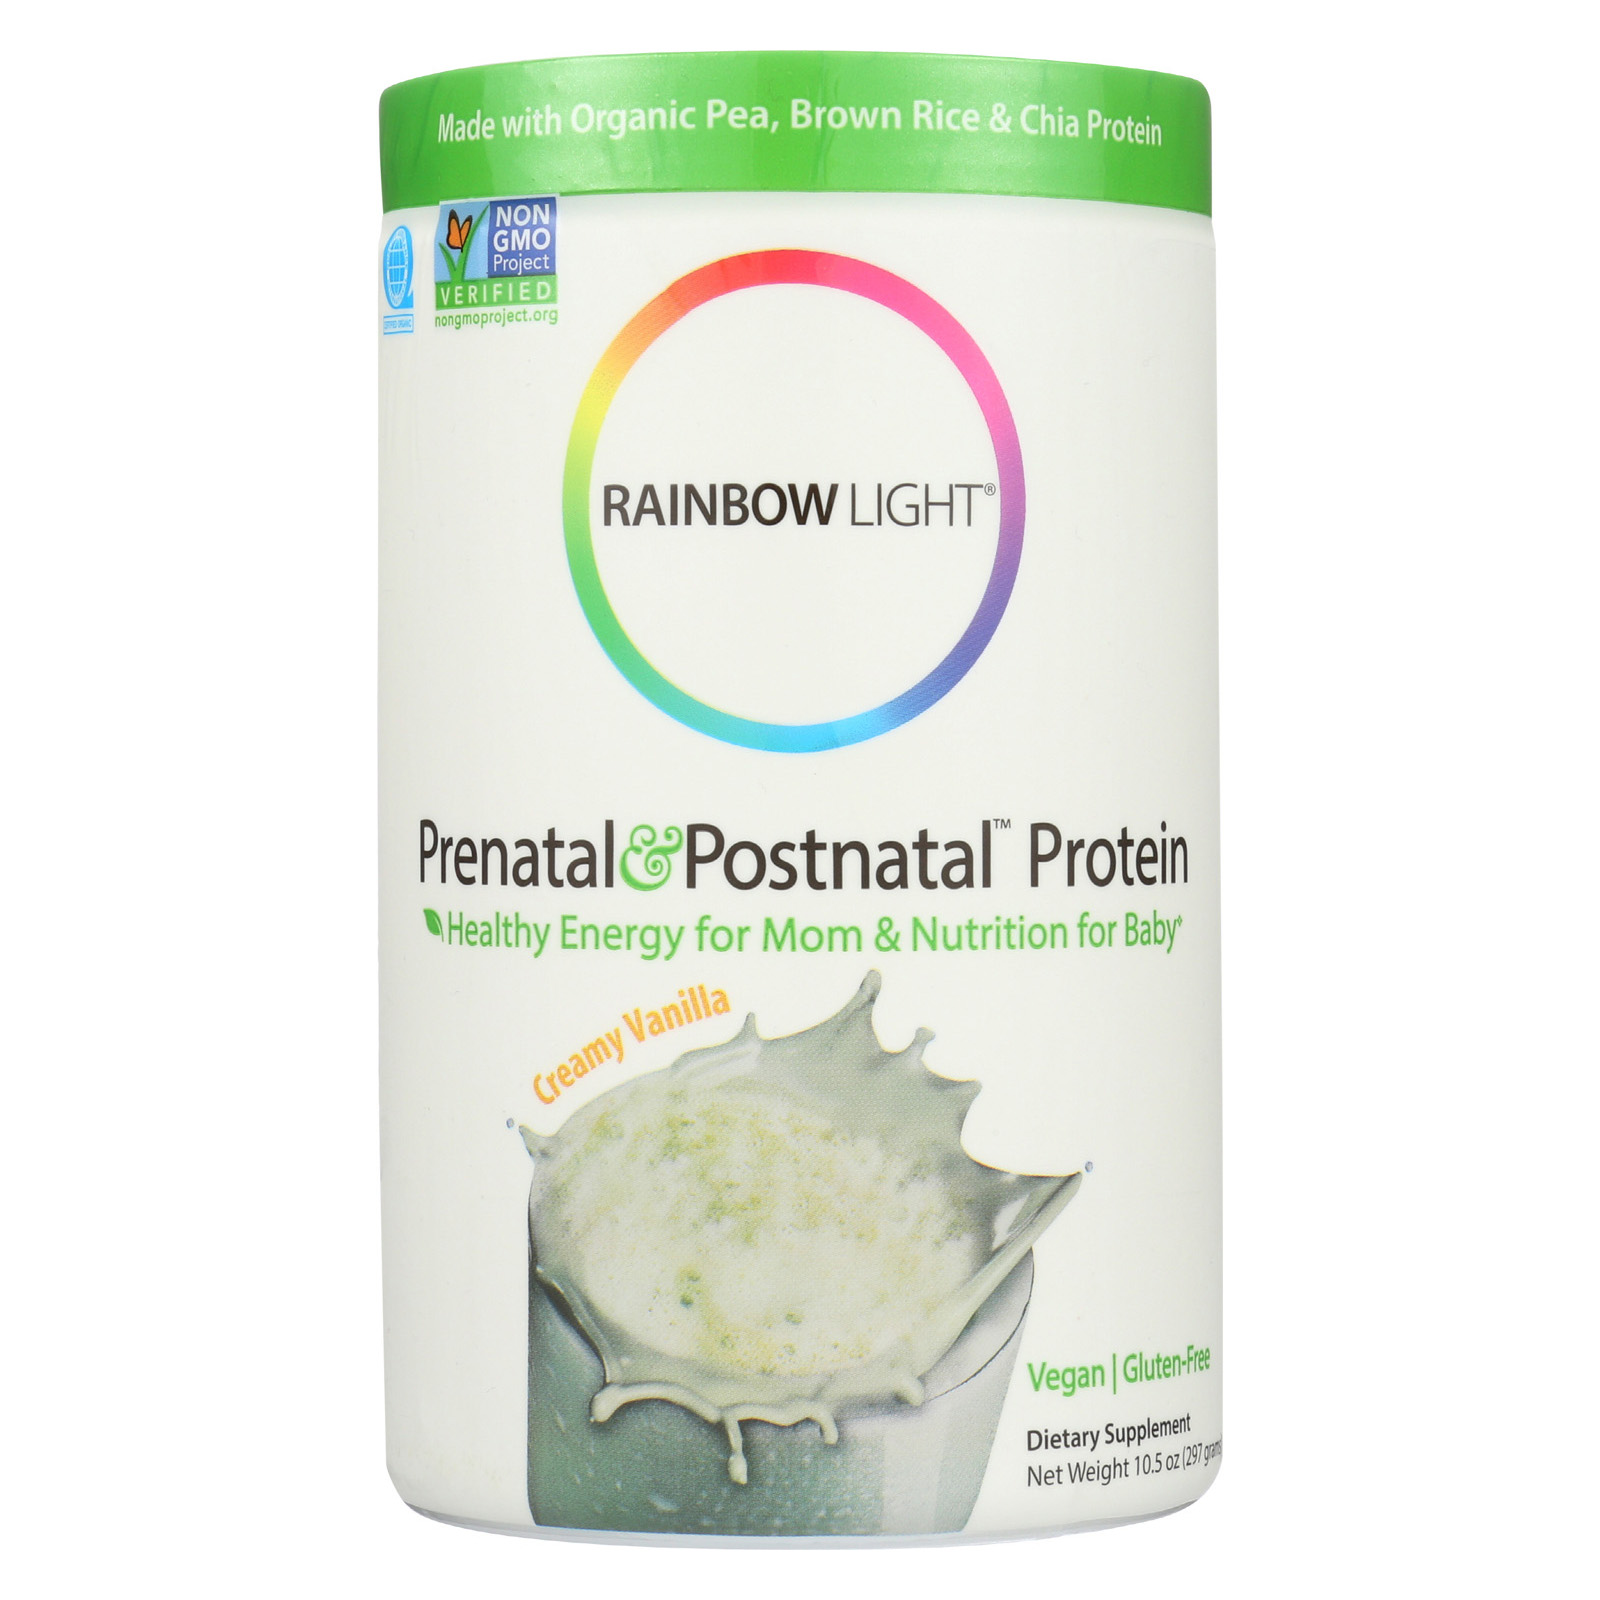 Rainbow Light Prenatal & Postnatal™ Protein Vanilla Tub 10.5 oz